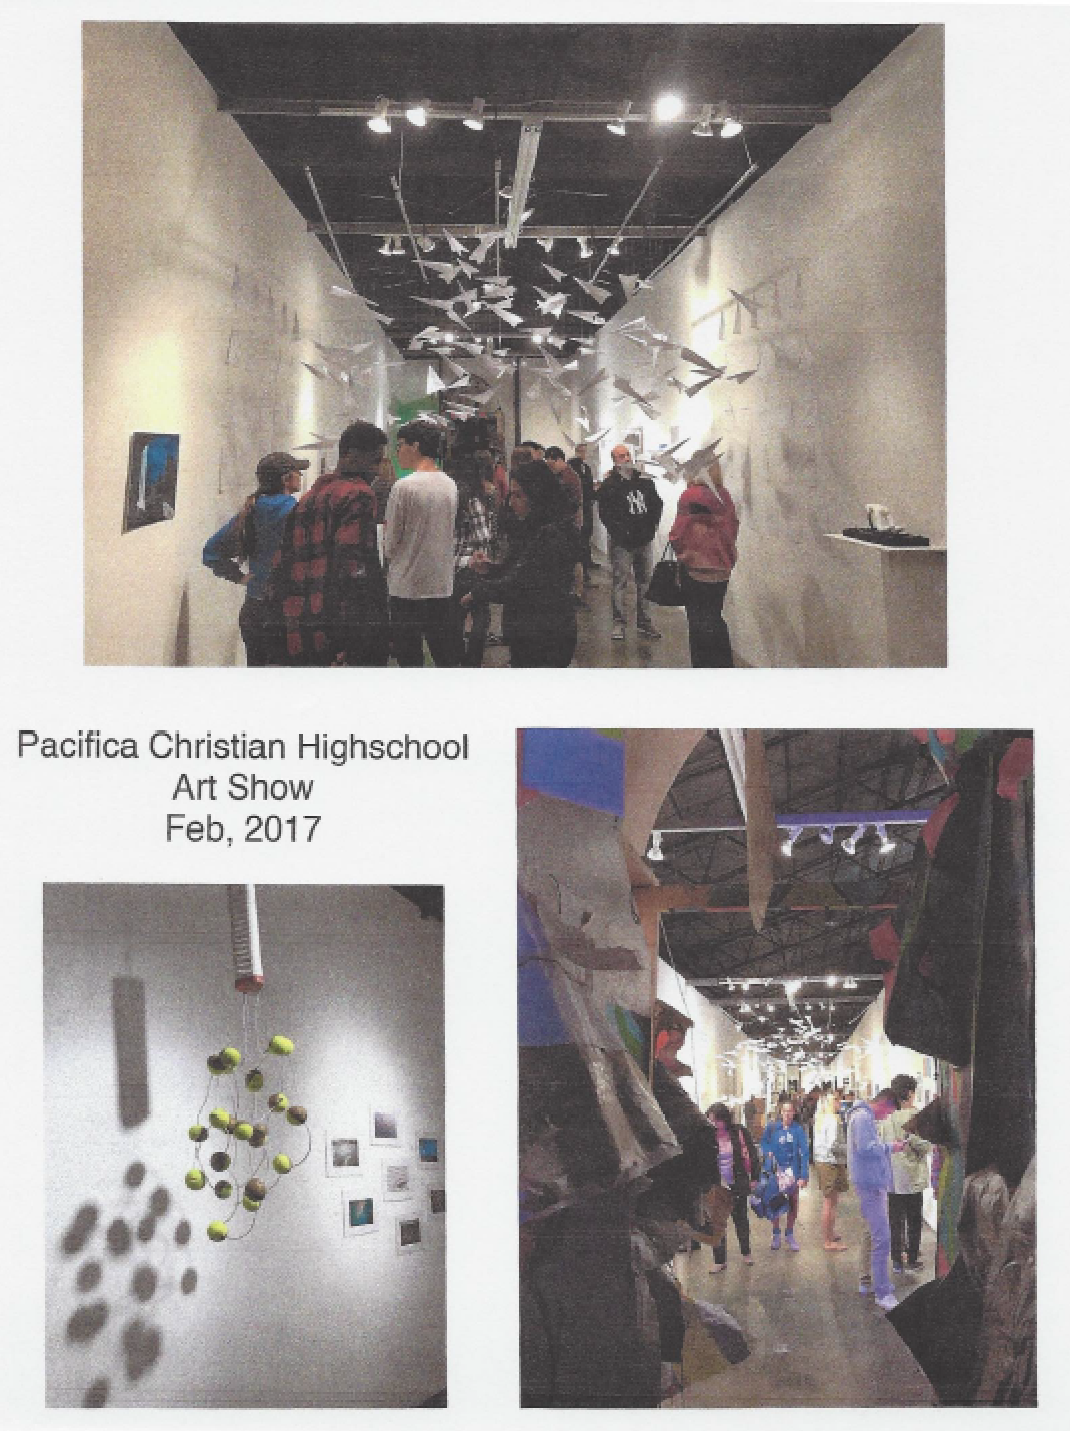 Pacifica Christian Highschool Art Show.png